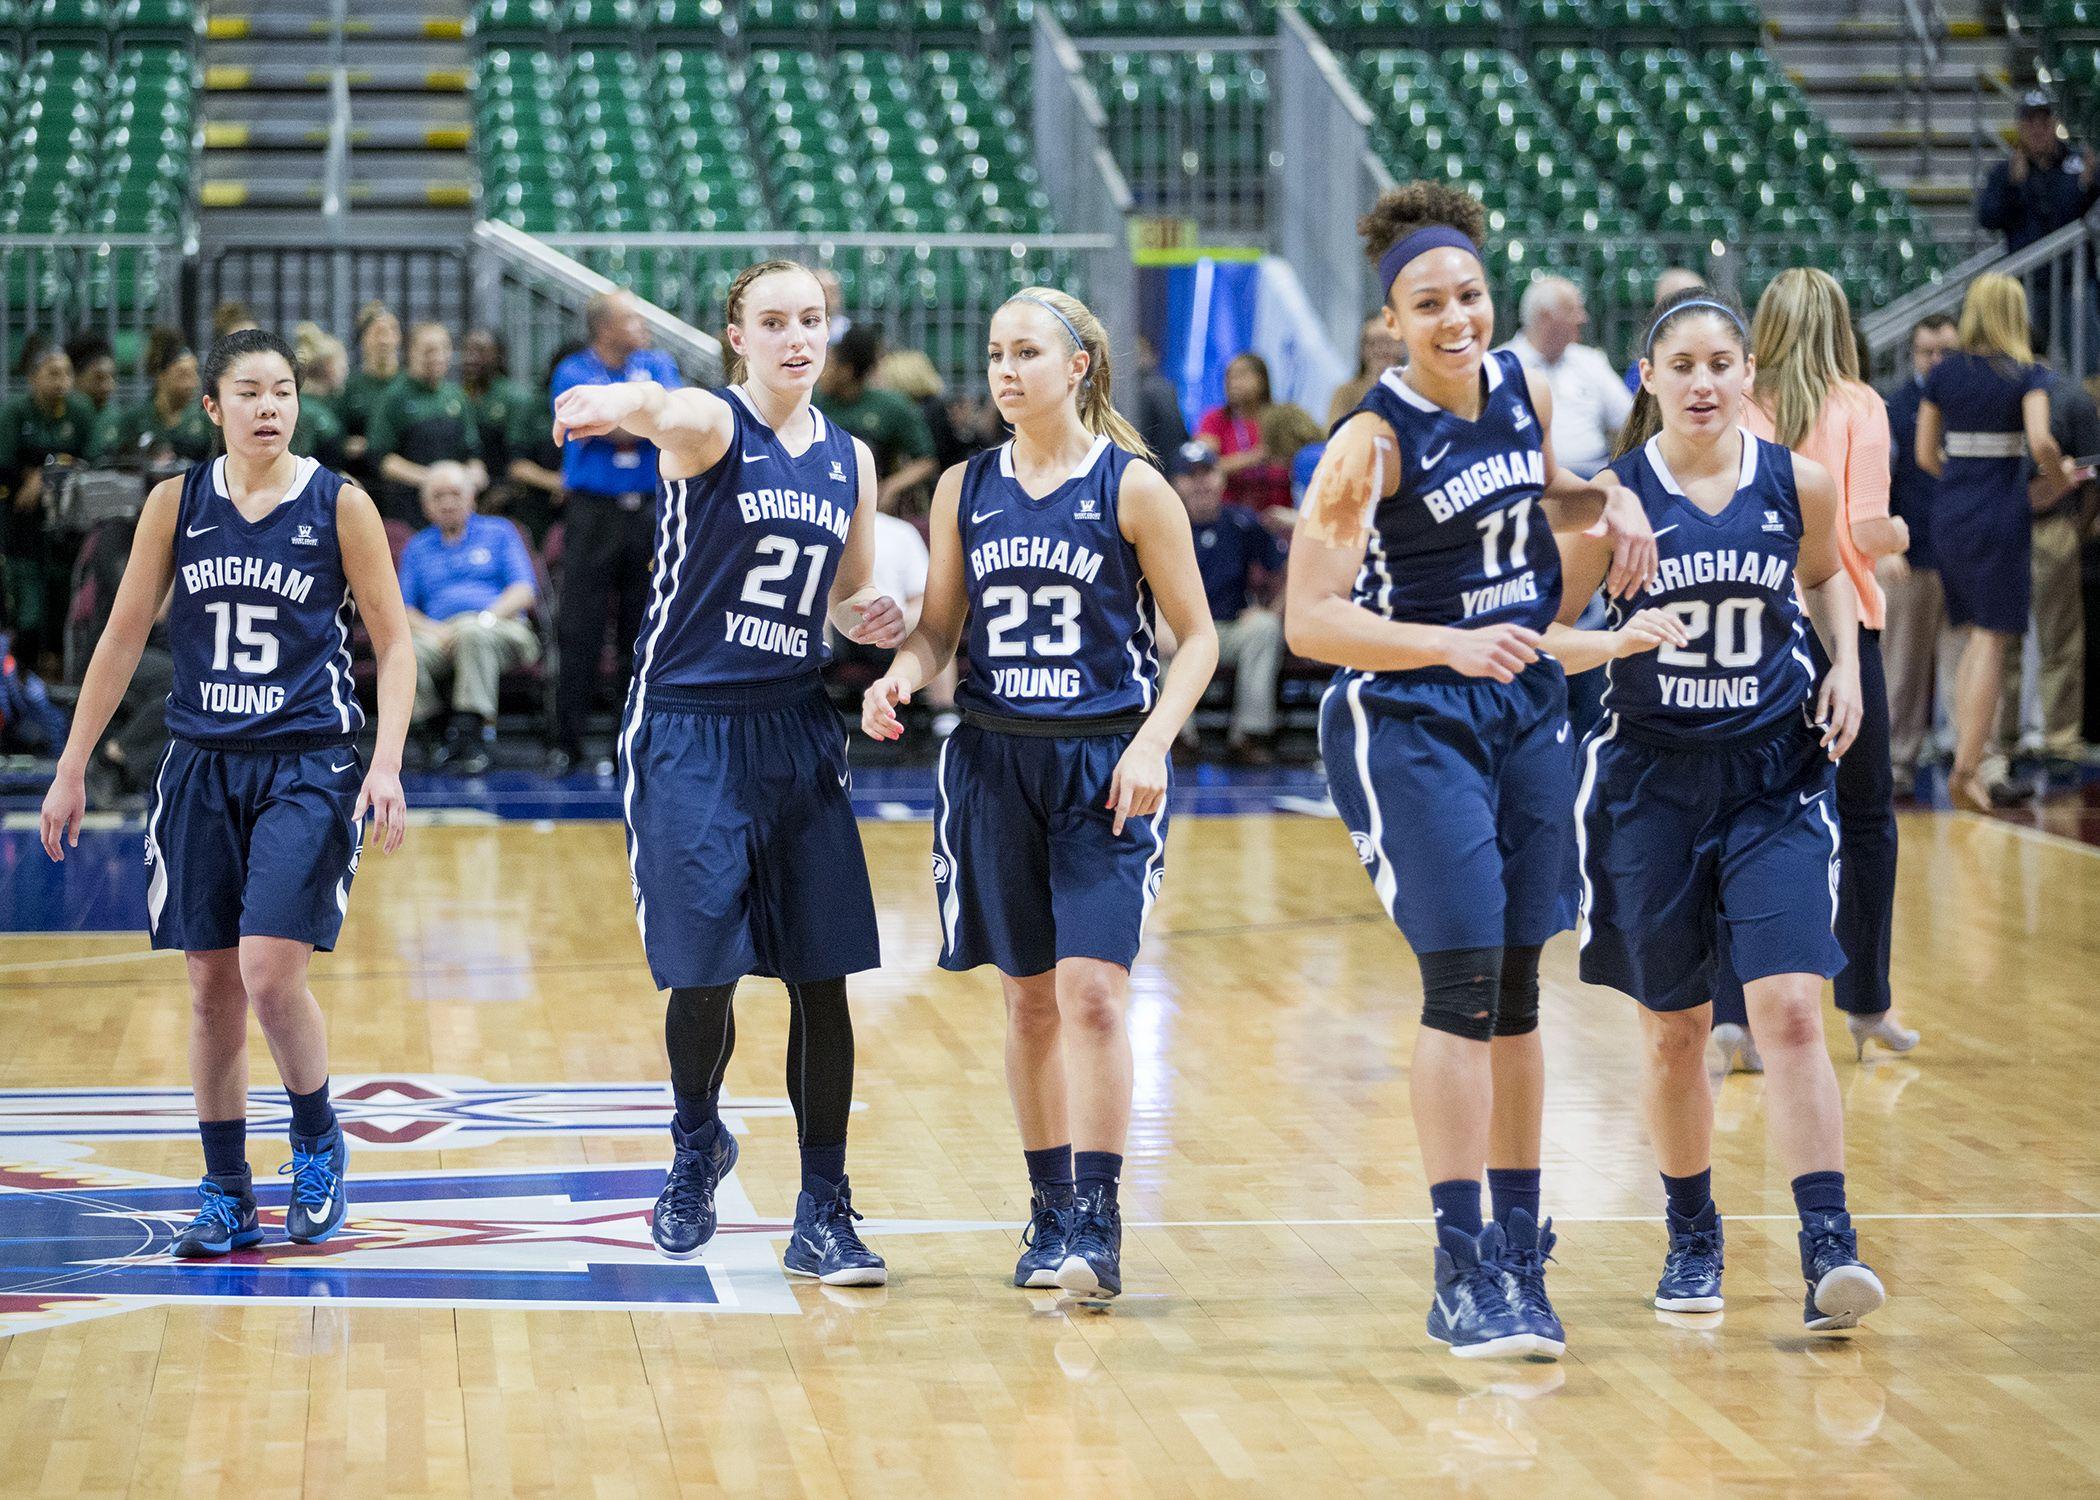 Wcc Championship Win Highlights Women S Basketball Season The Daily Universe Womens Basketball Basketball Season Basketball